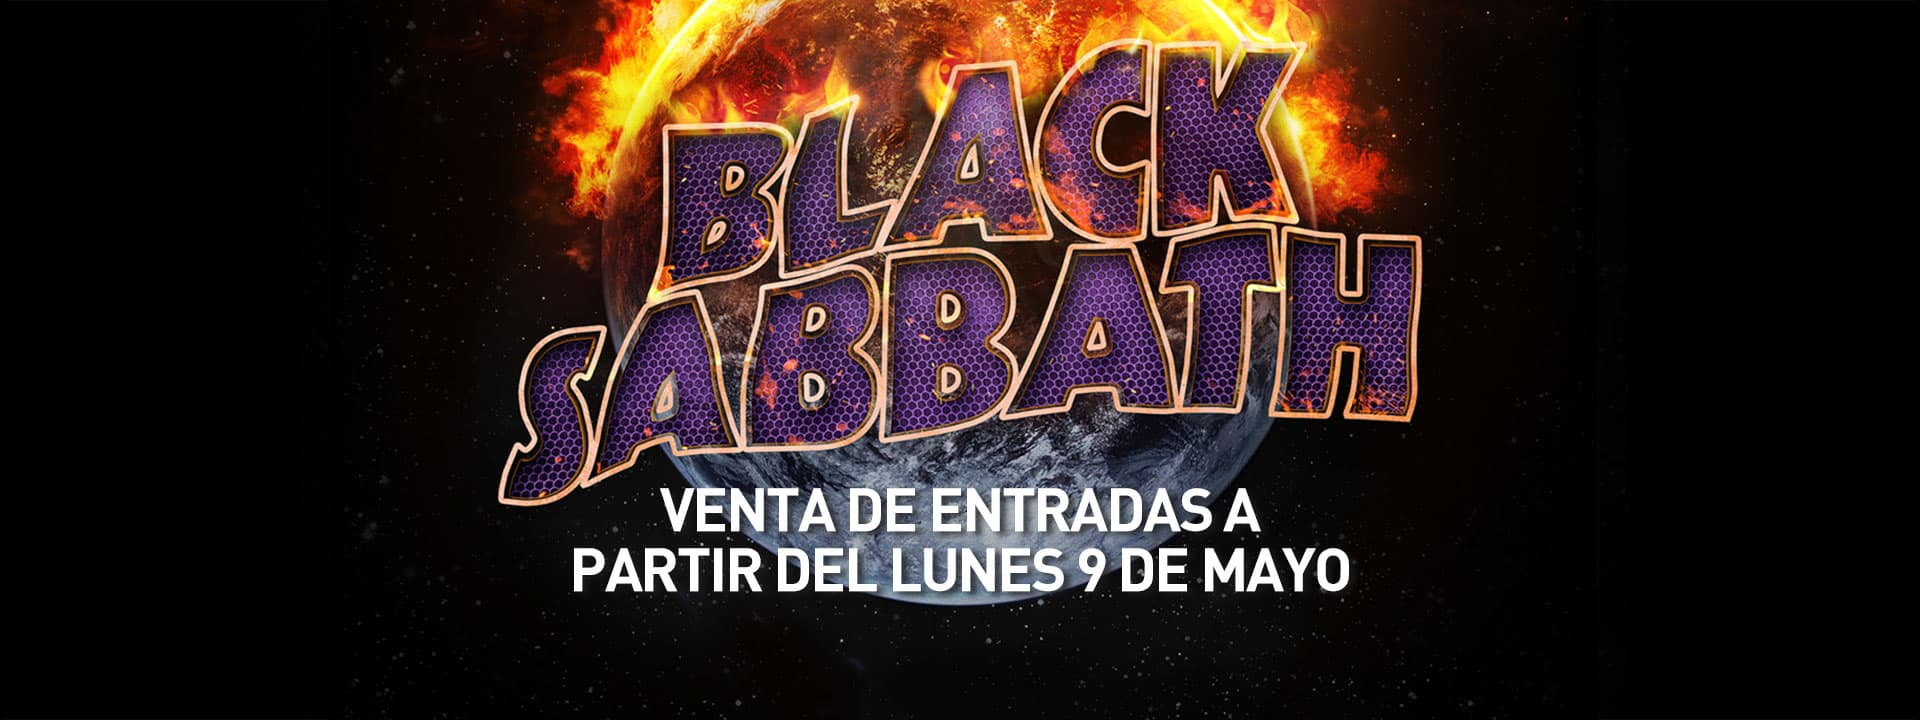 entradas black sabbath argentina 2016 estadio velez all access. Black Bedroom Furniture Sets. Home Design Ideas